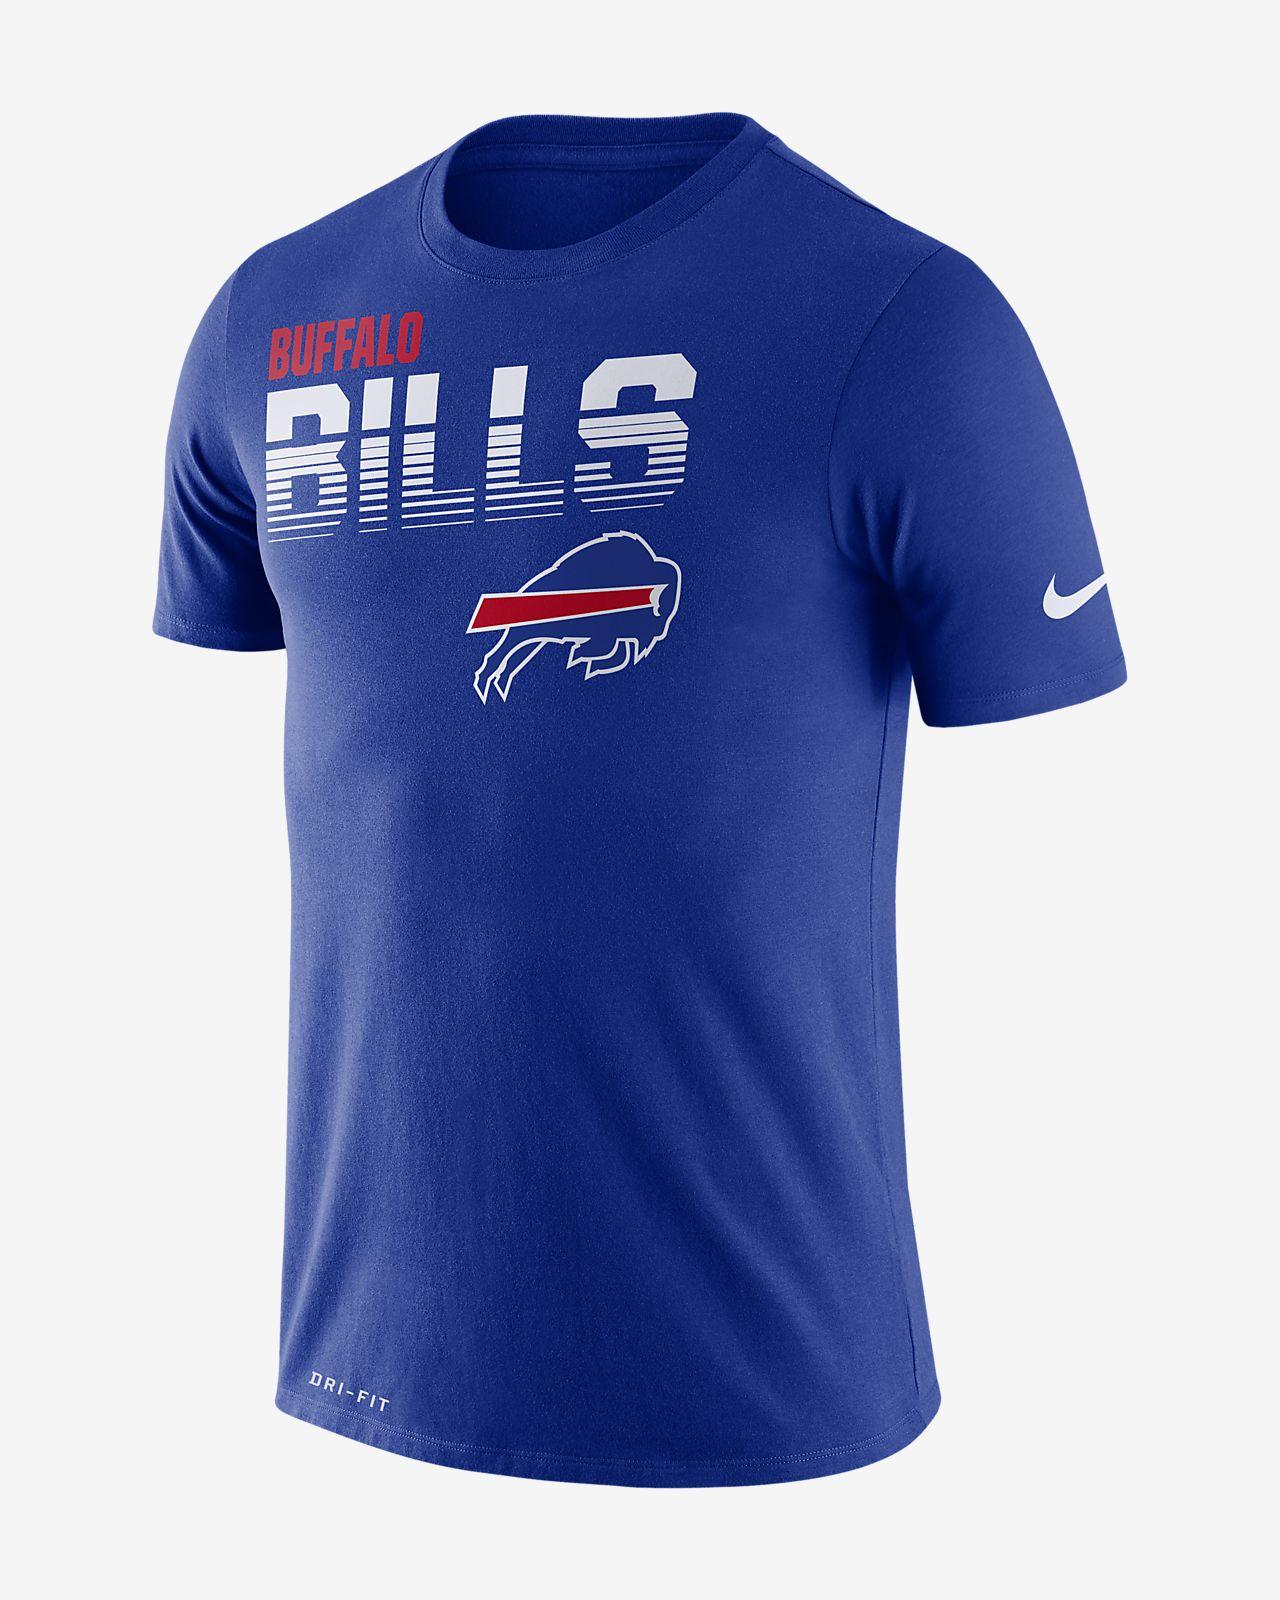 Nike Legend (NFL Bills) Kısa Kollu Erkek Tişörtü